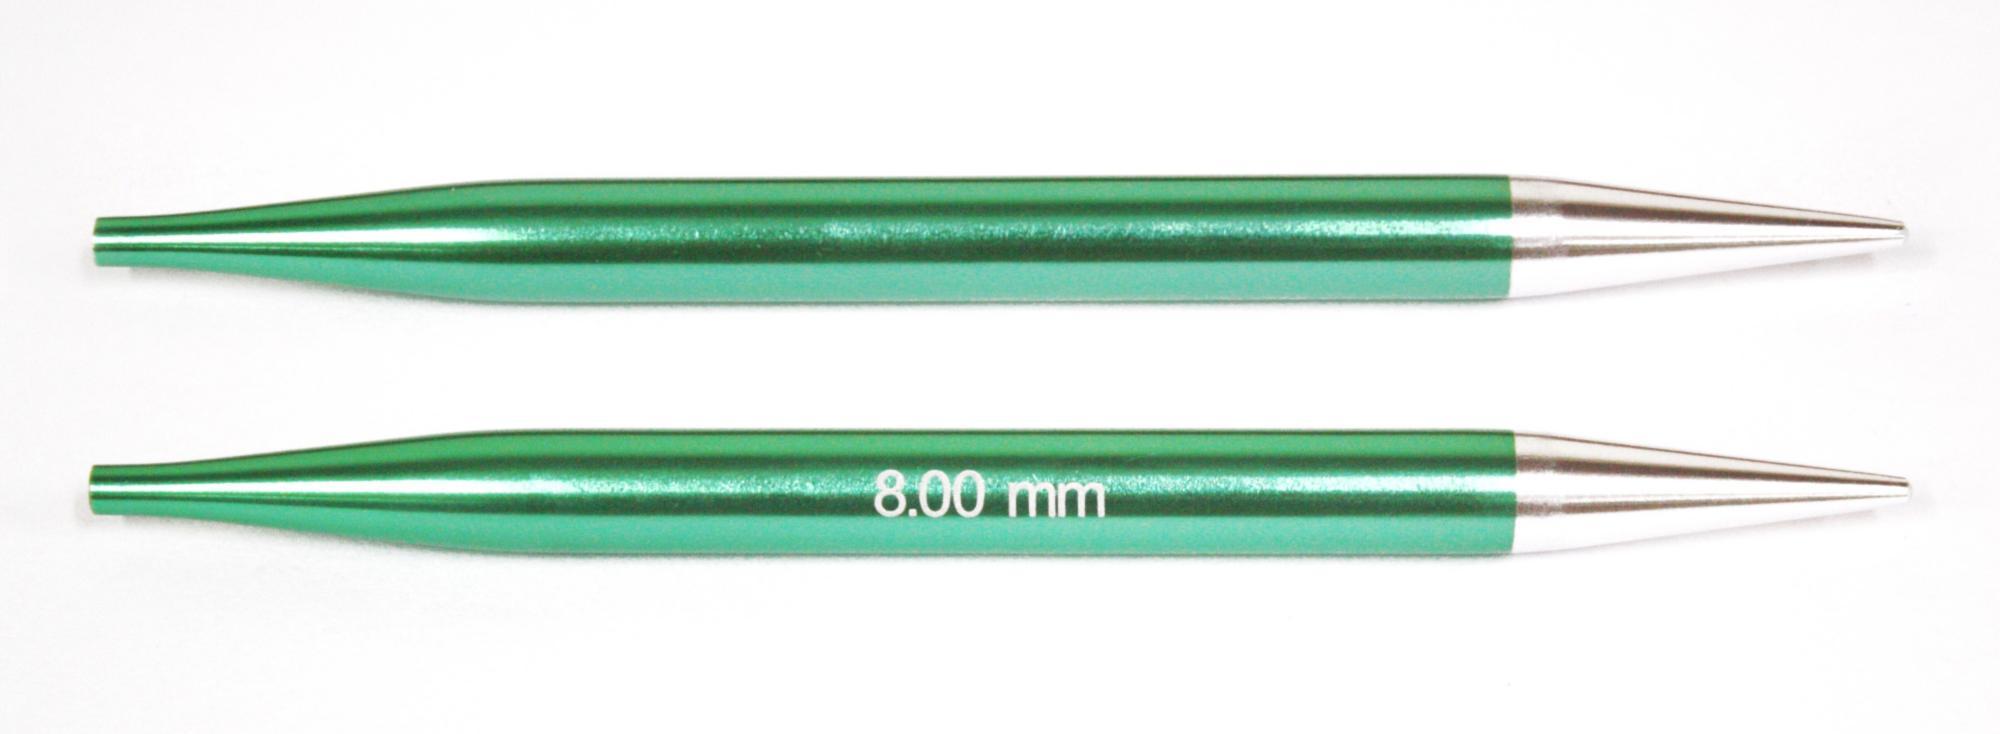 Спицы съемные Zing KnitPro, 47510, 8.00 мм